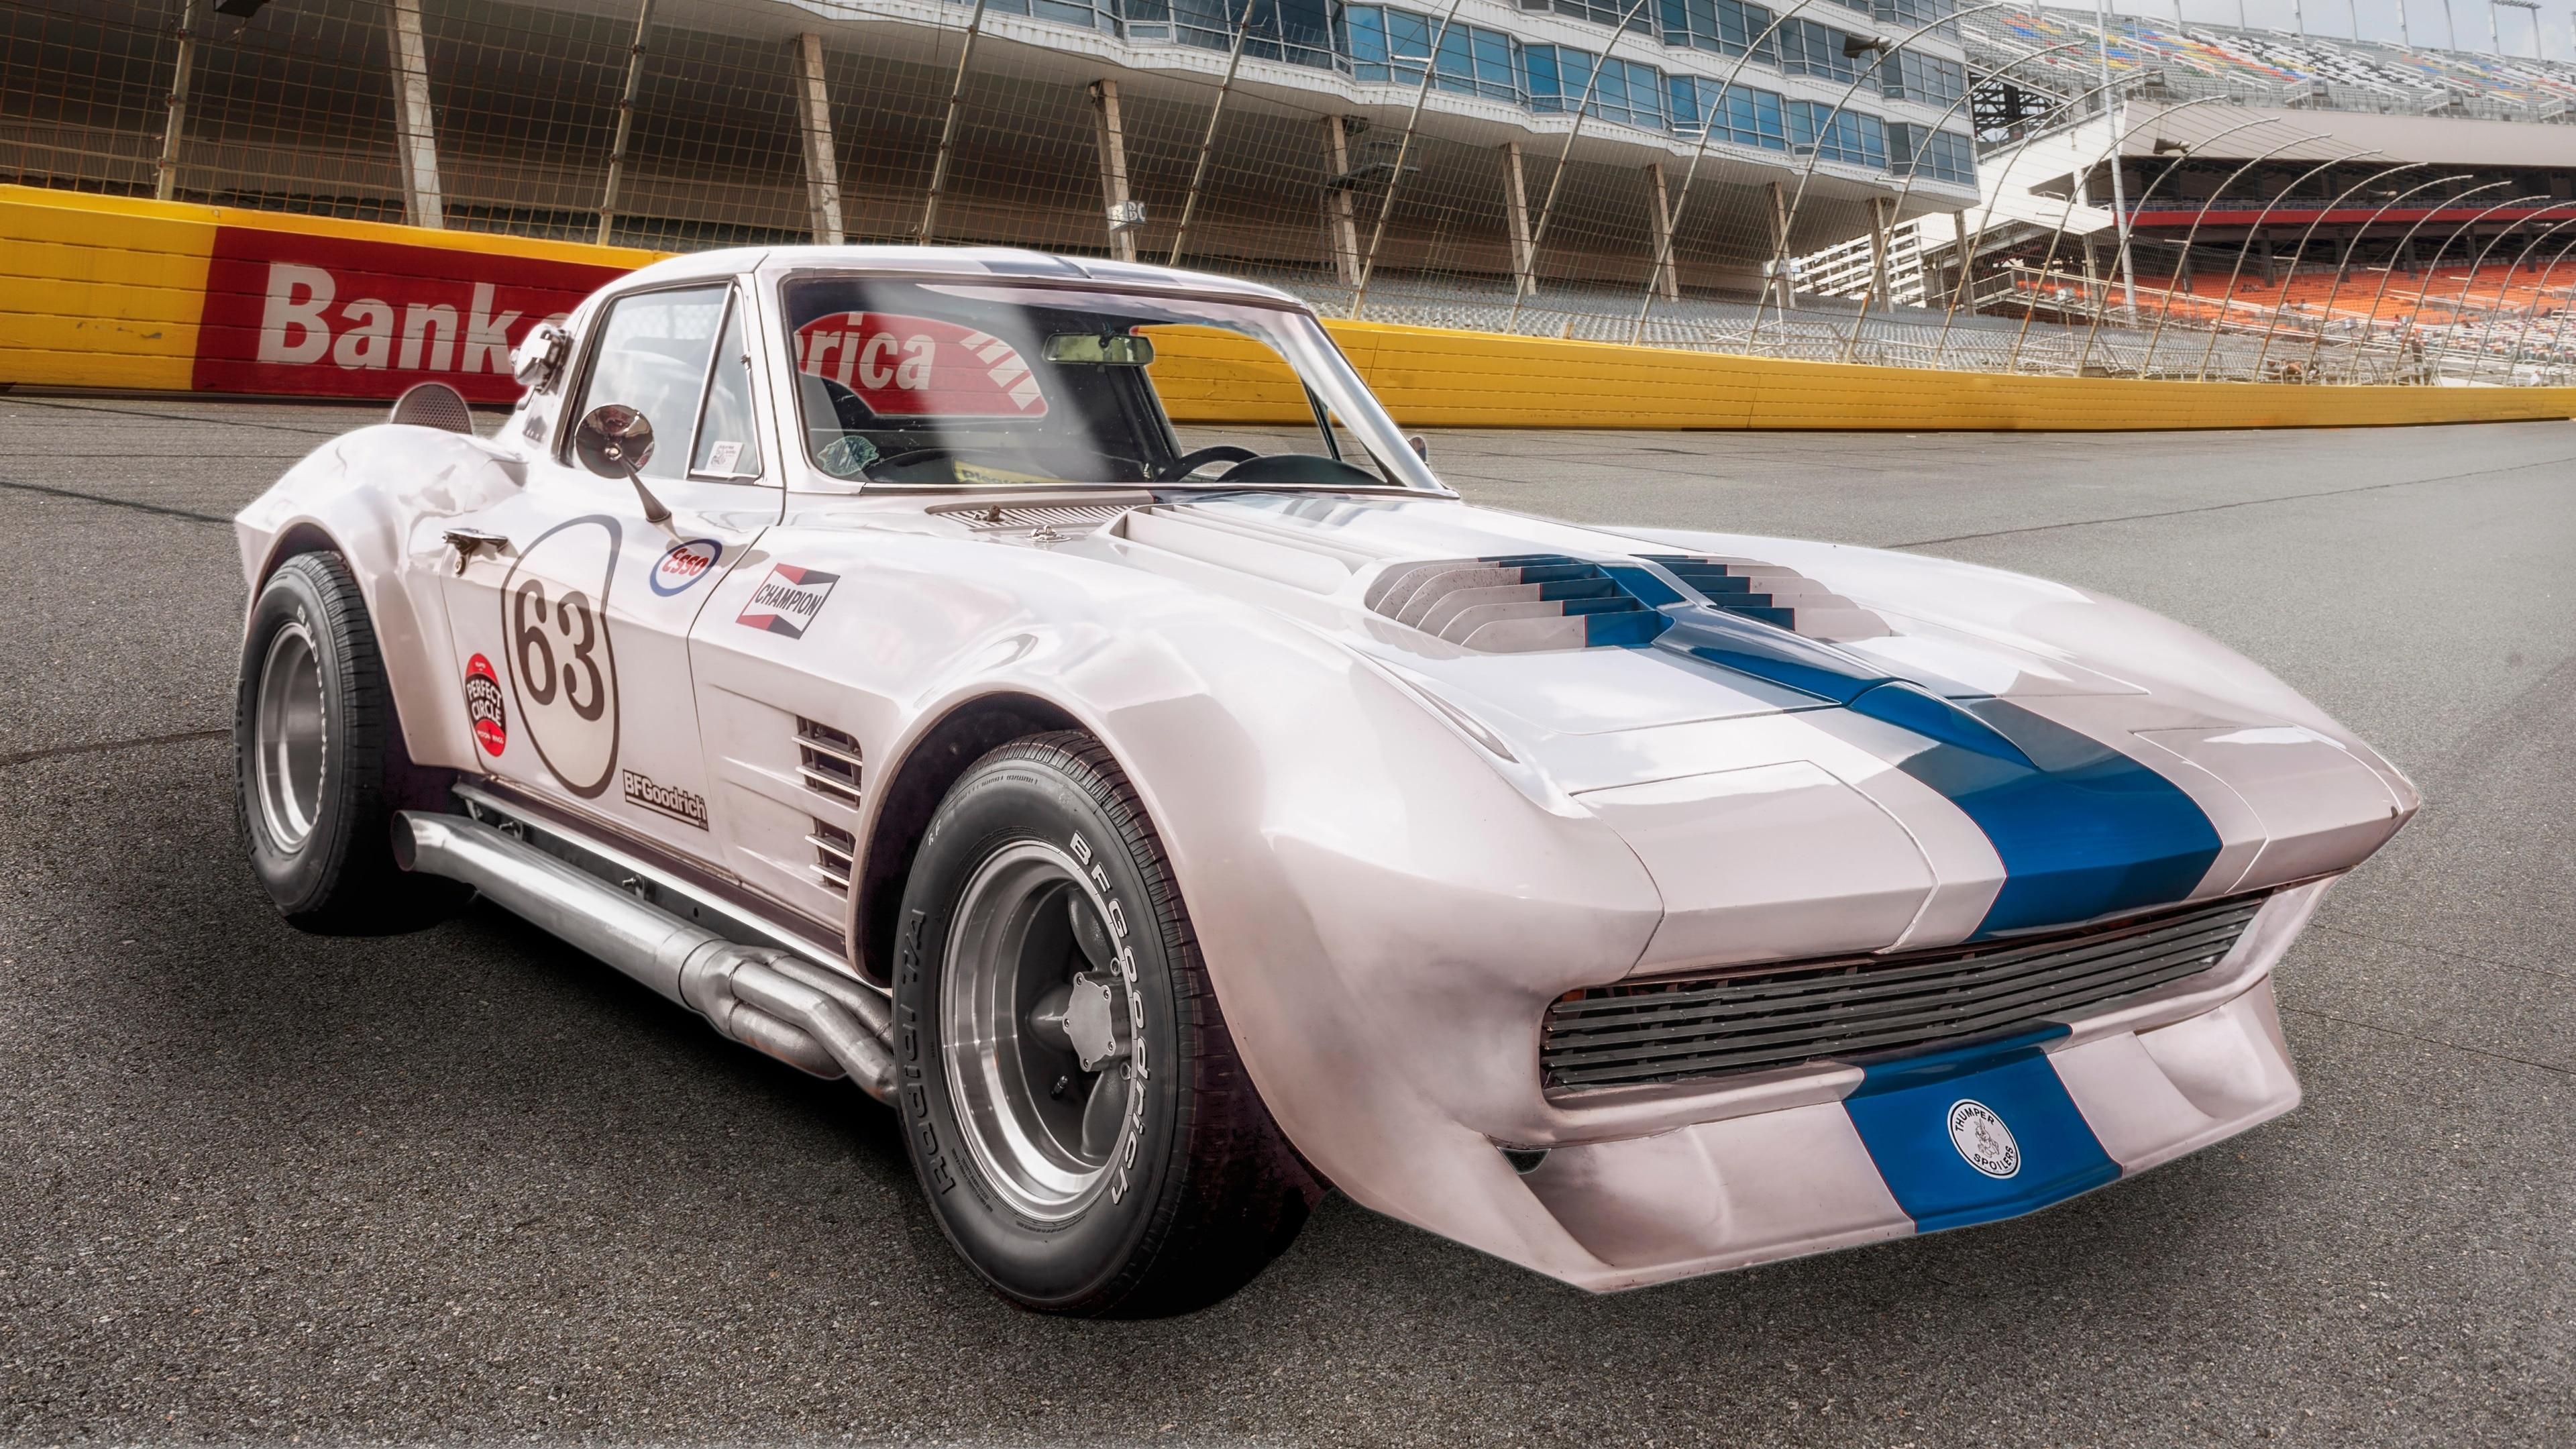 Charlotte Motor Speedway, Concord, North Carolina, United States of America